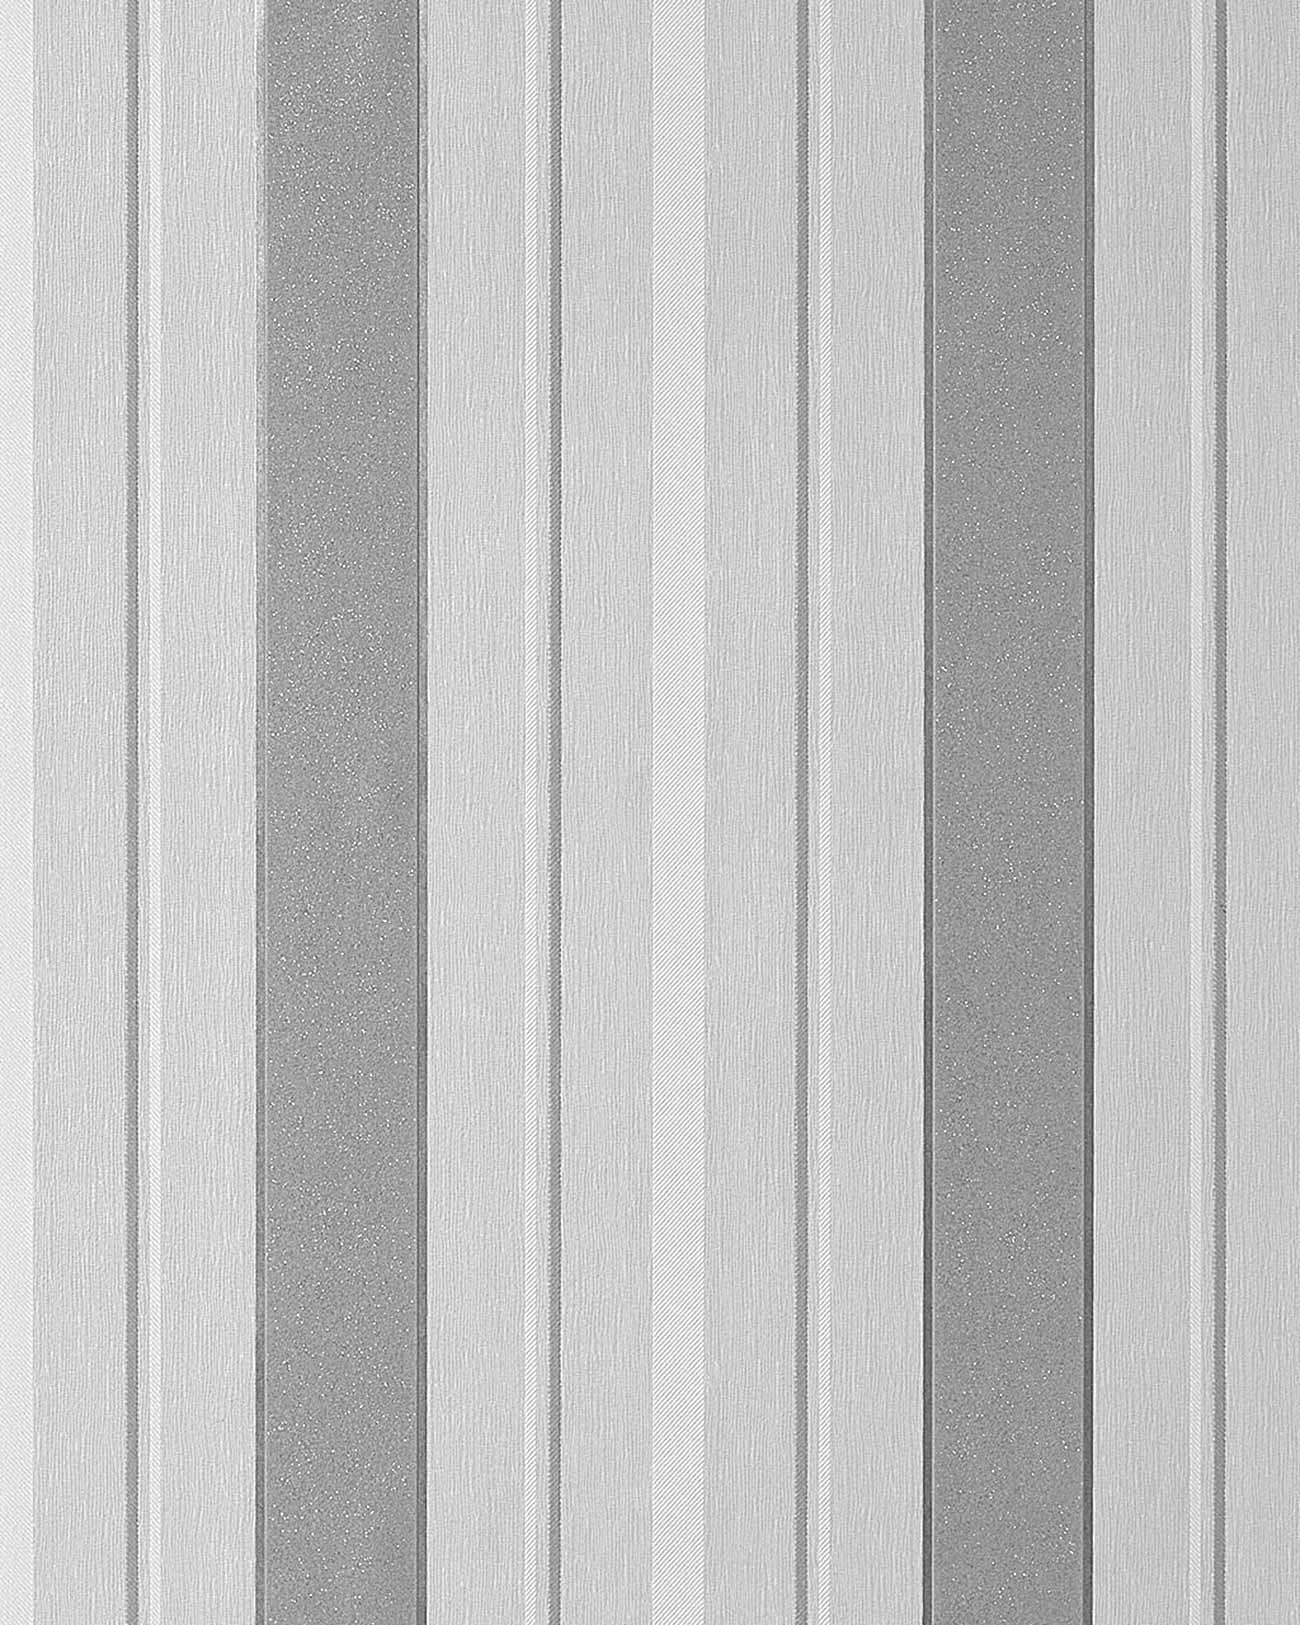 Papel pintado texturado dise o rayas gruesas edem 069 26 for Papel pintado blanco y plata